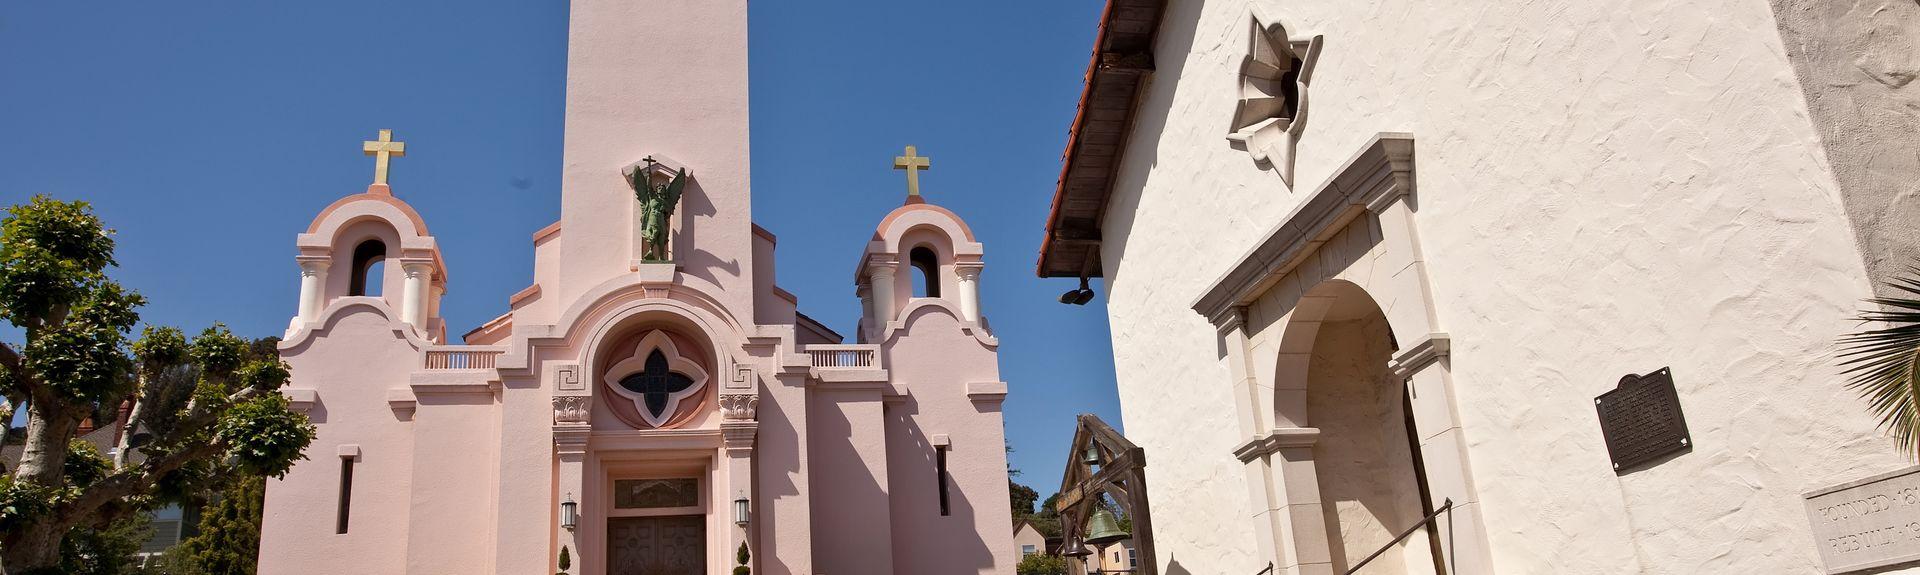 San Rafael, California, United States of America